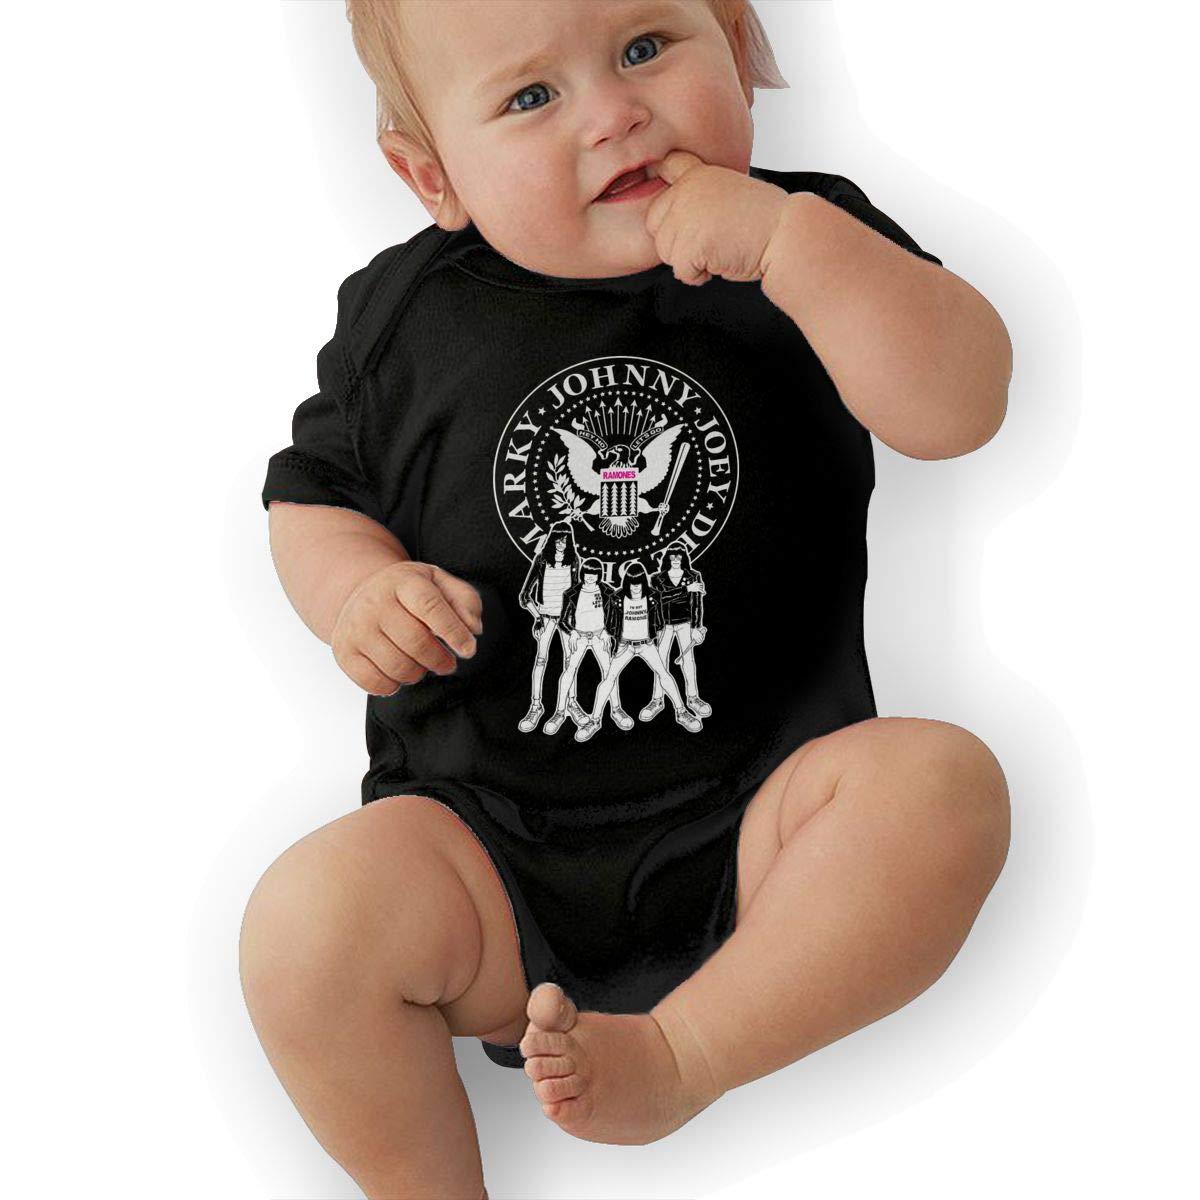 LuckyTagy The Ramones Unisex Classic Toddler Romper Baby BoyVest Black